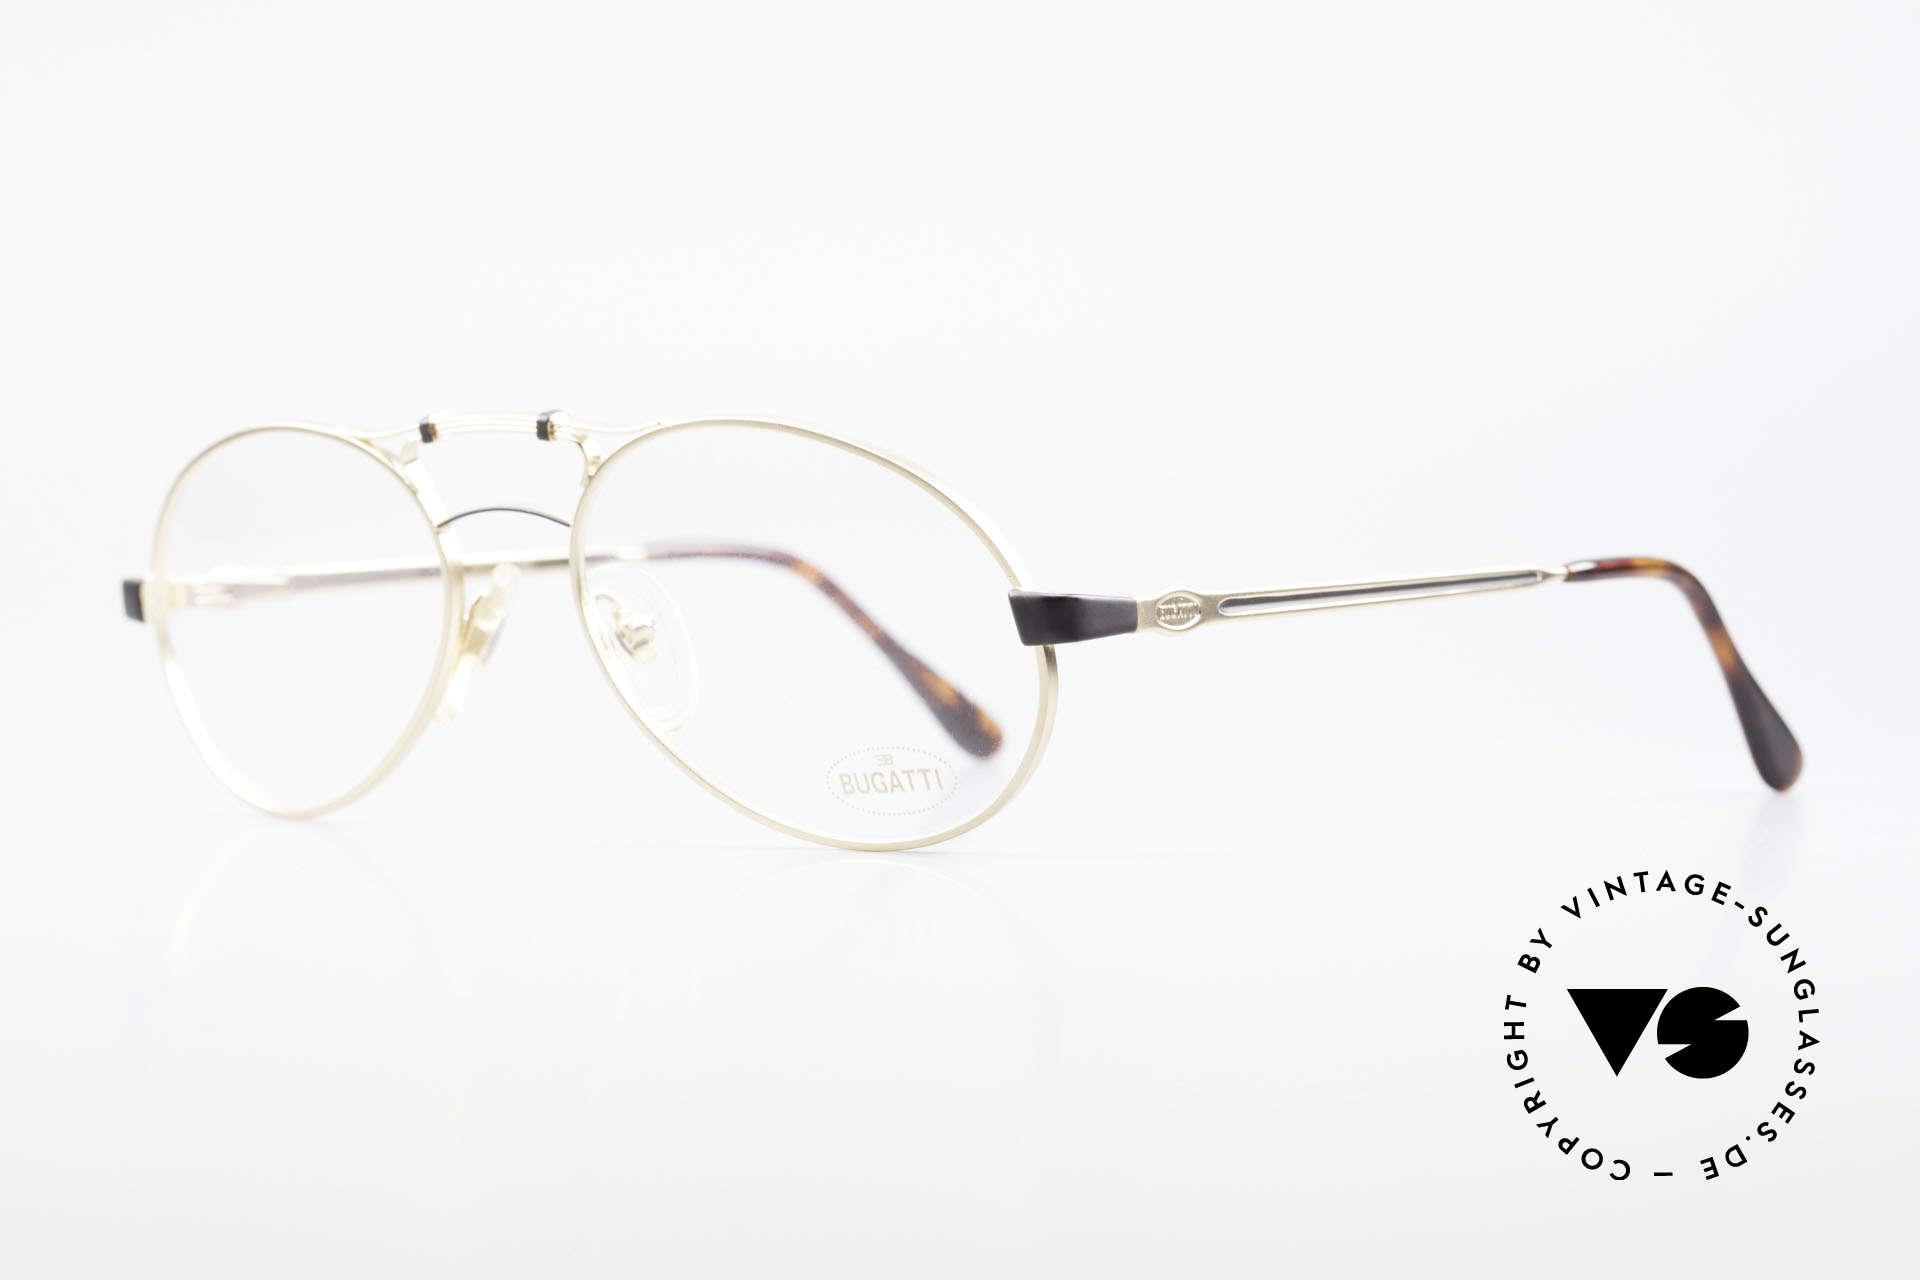 Bugatti 13411 Vintage Men's Eyeglass Frame, Bugatti's legendary men's design (tear drop shaped), Made for Men